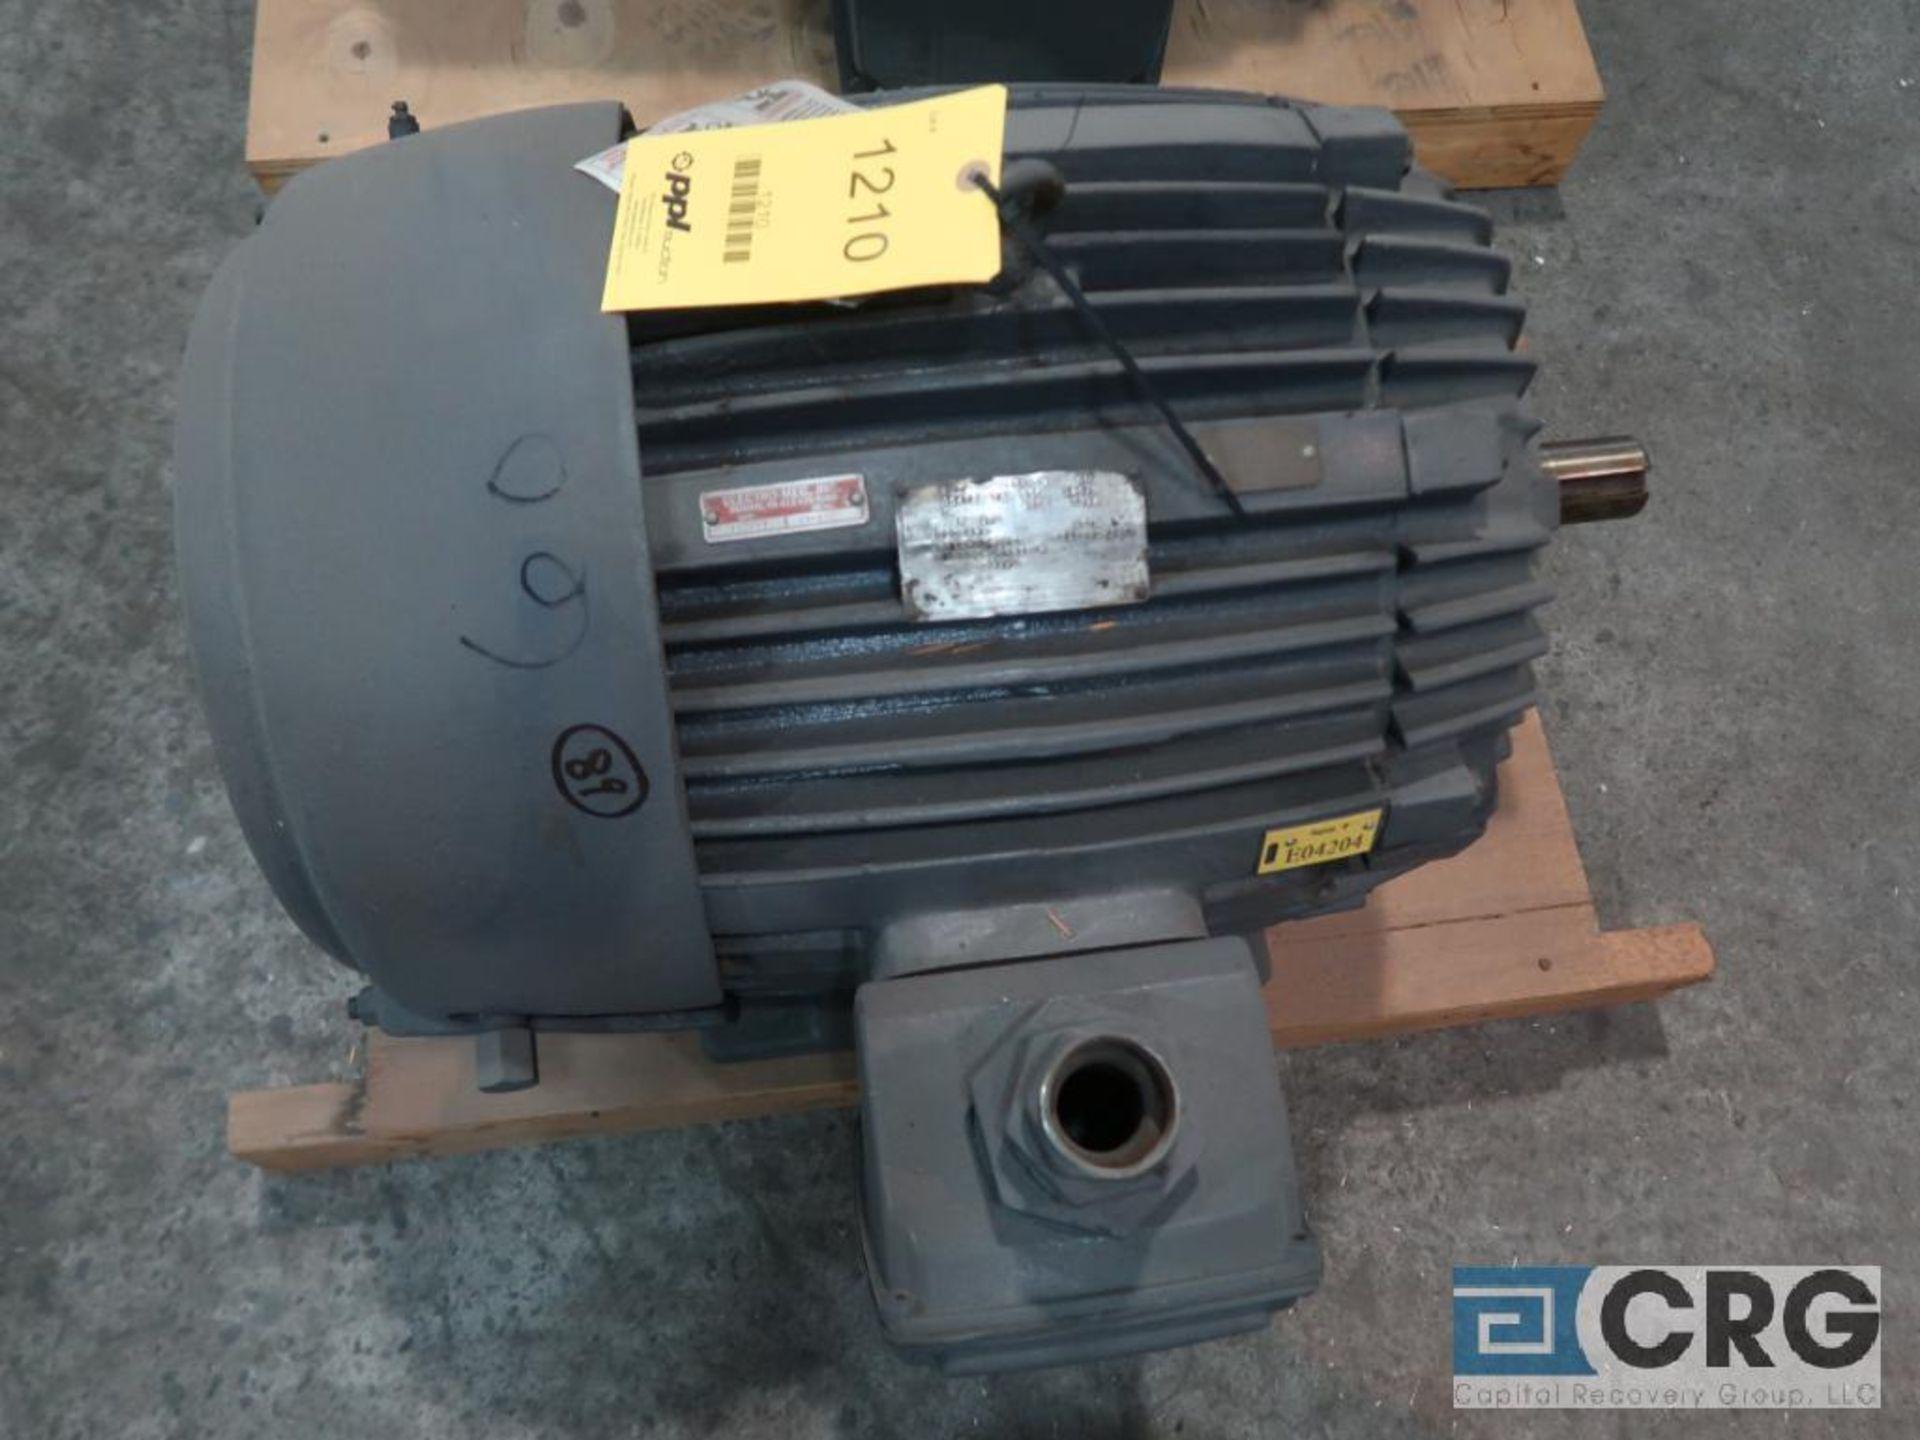 U.S. Electrical Motors electric motor, 60 HP, 1,775 RPMs, 230/460 volt, 3 ph., 364TS frame (Finish